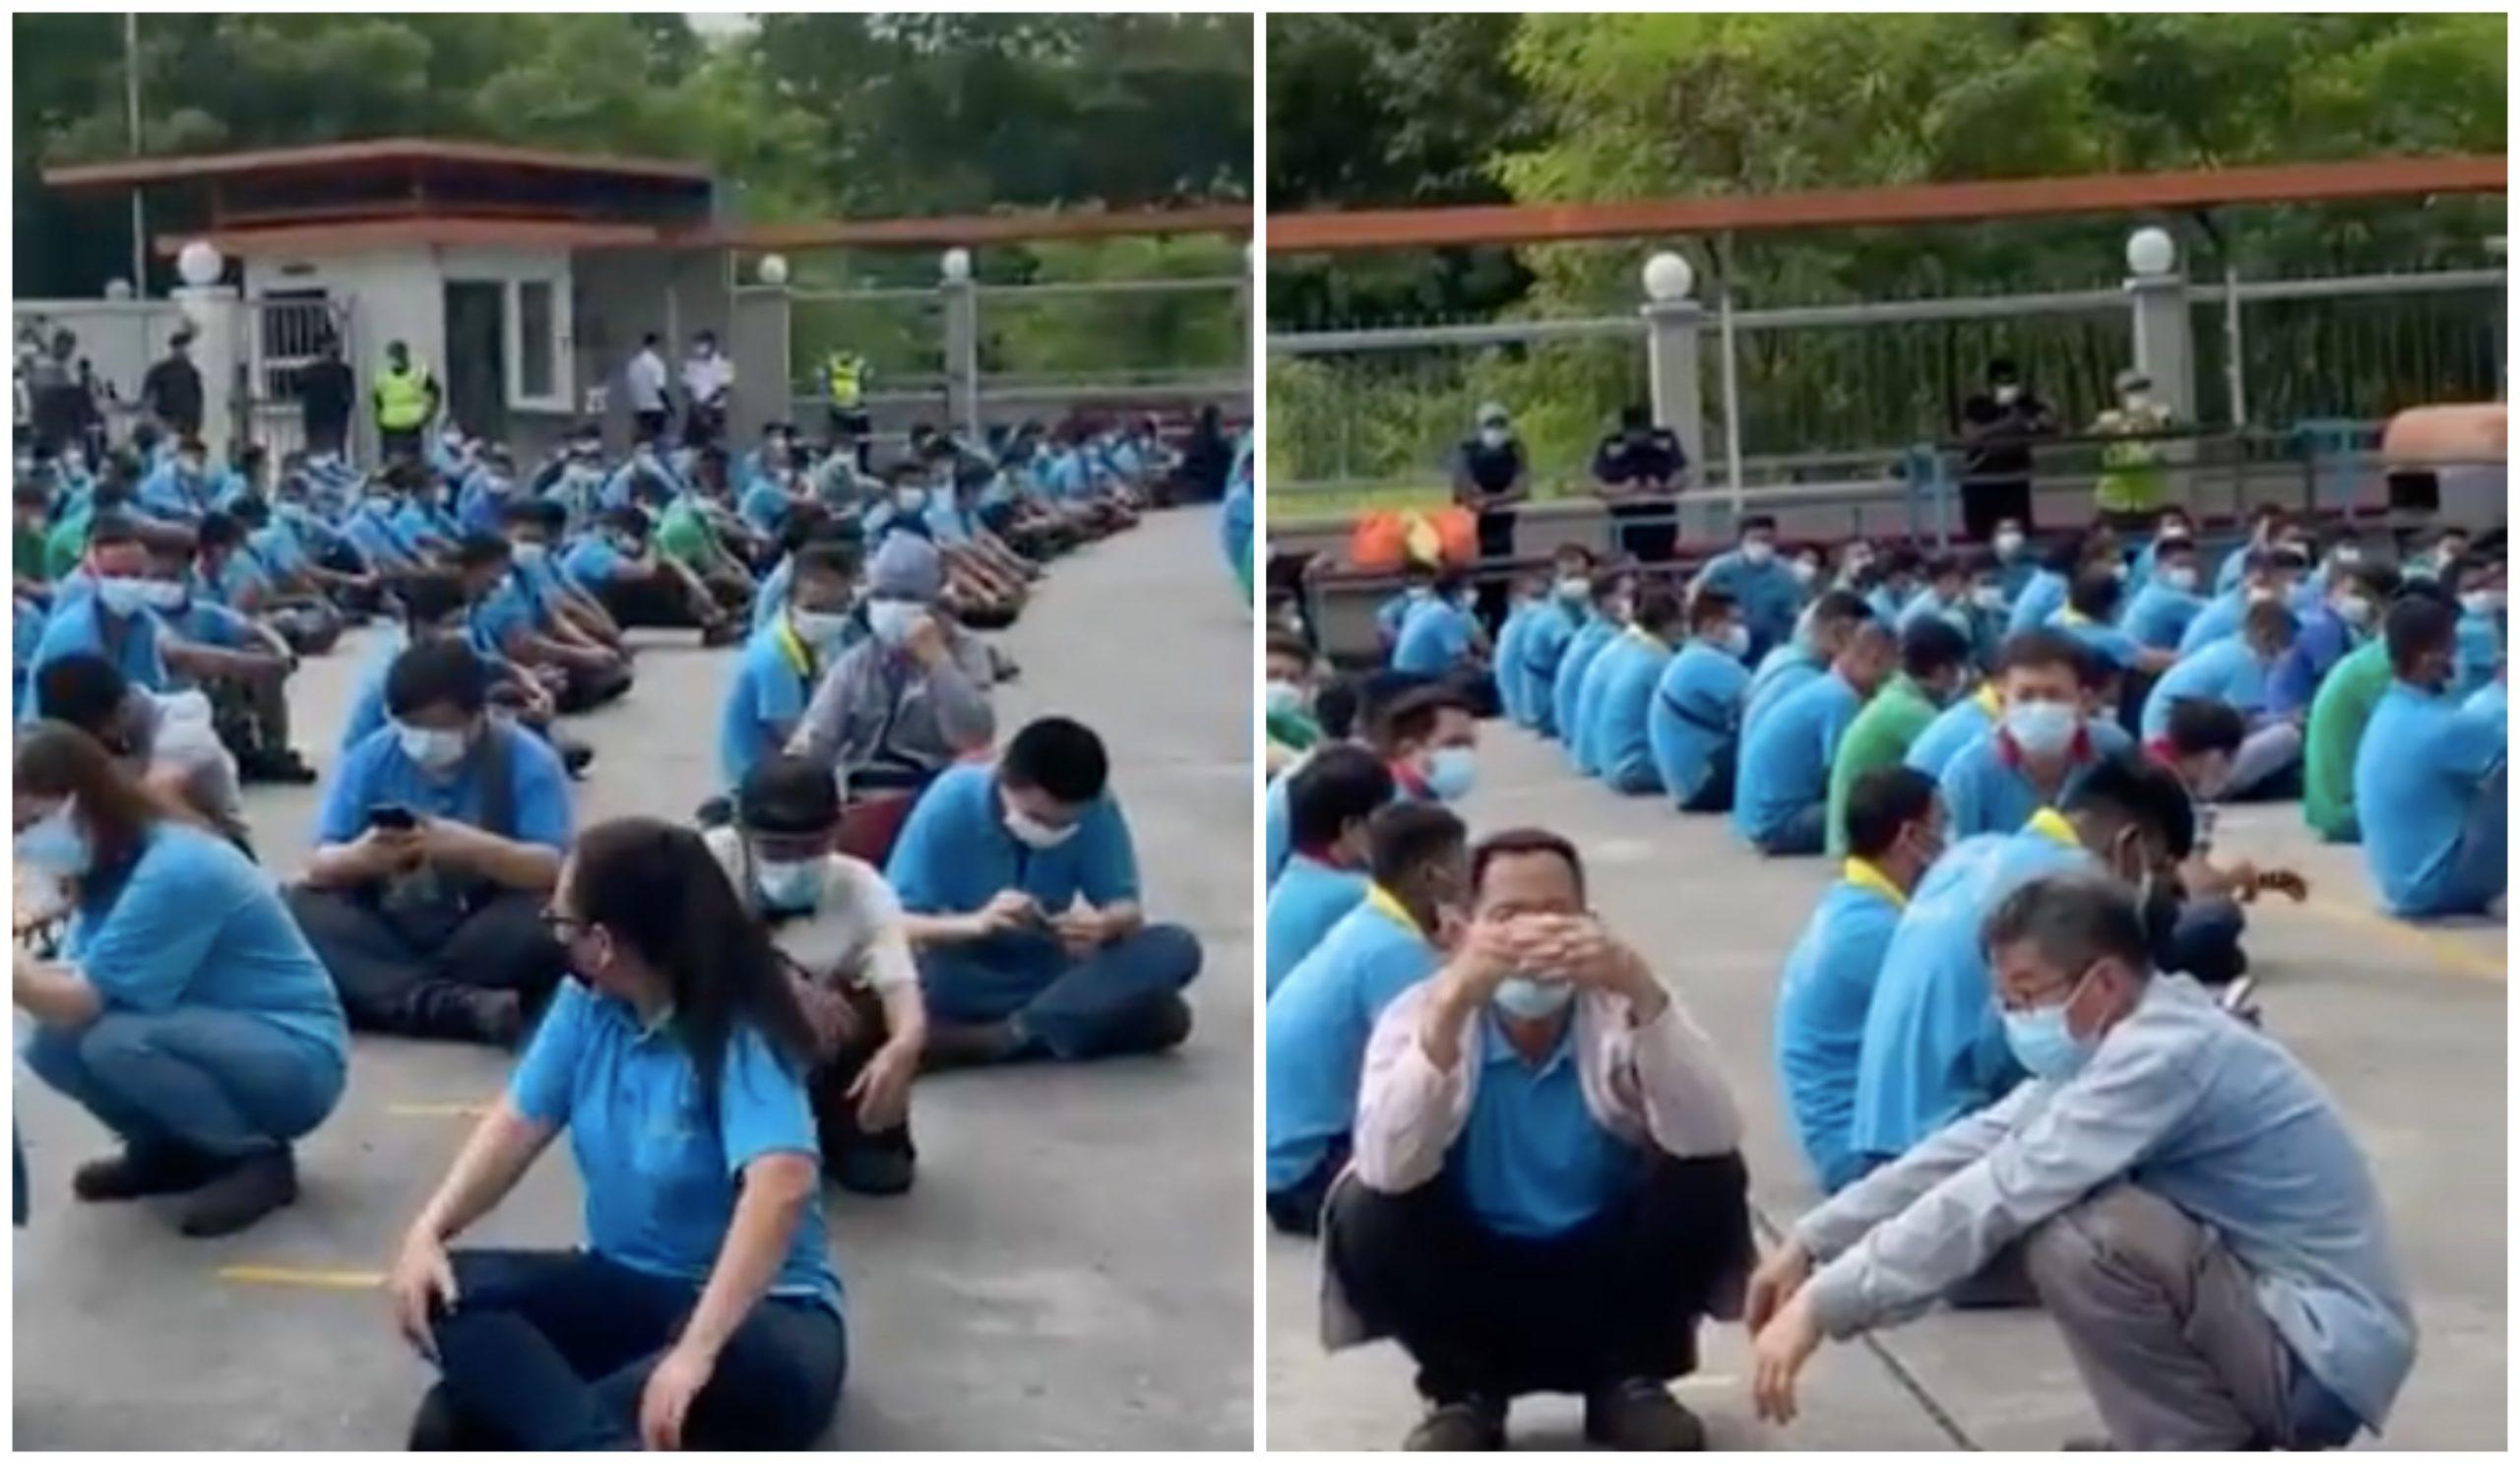 Kilang Diserbu, 350 Pekerja Ditahan Untuk Pemeriksaan. Netizen Minta Pihak Berkuasa Dedah Wajah Majikan